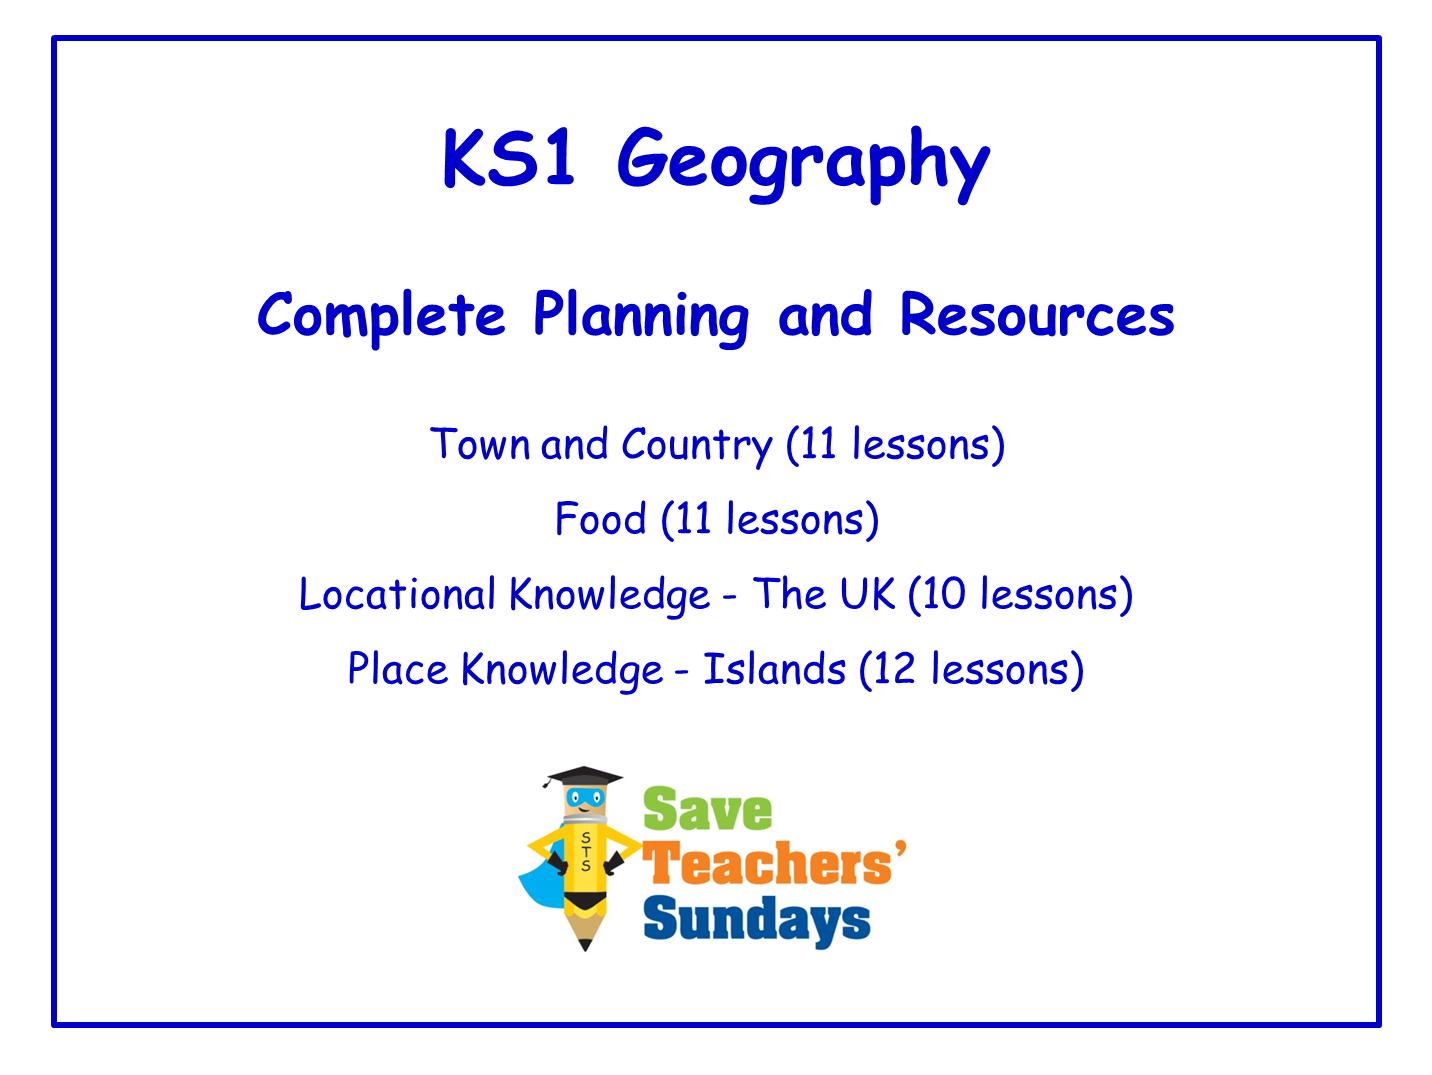 KS1 Geography Bundle